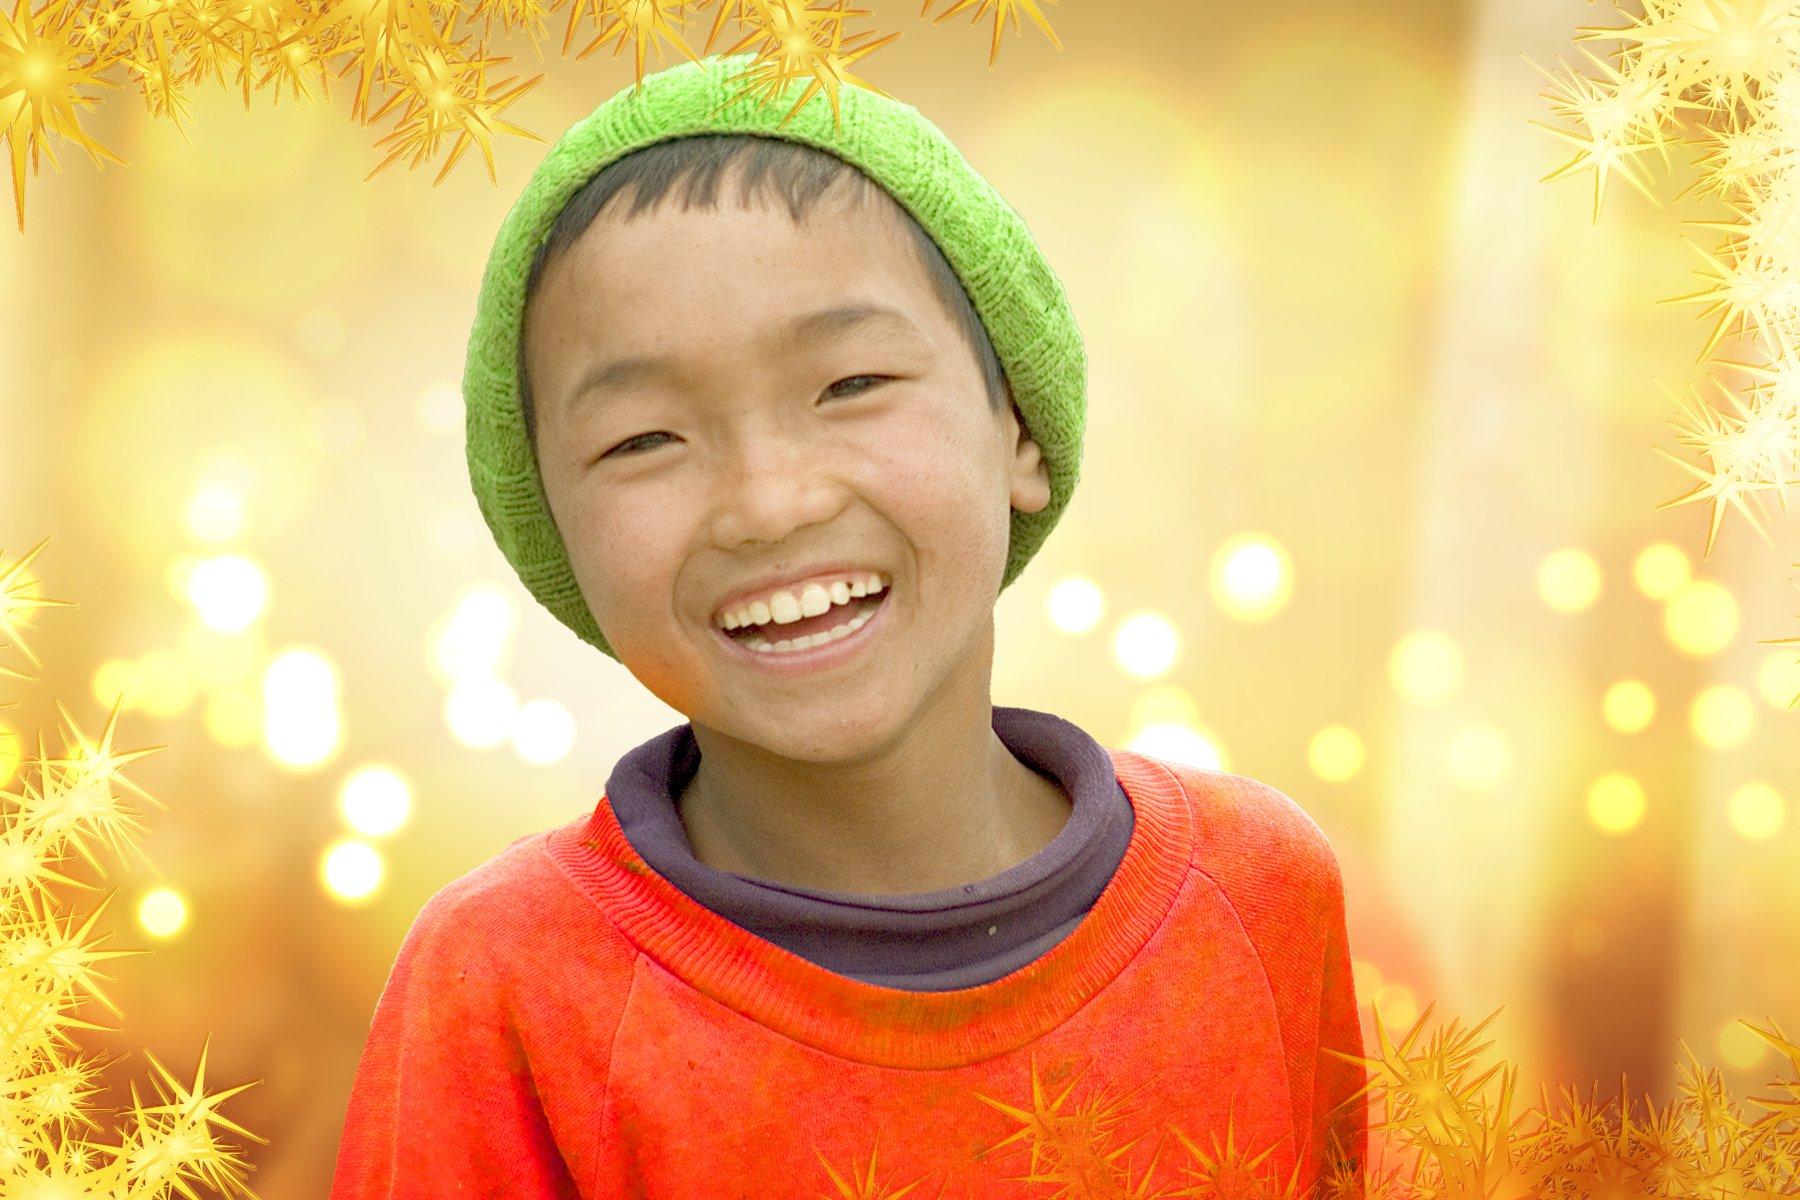 10-08-boy-smiling3.jpg